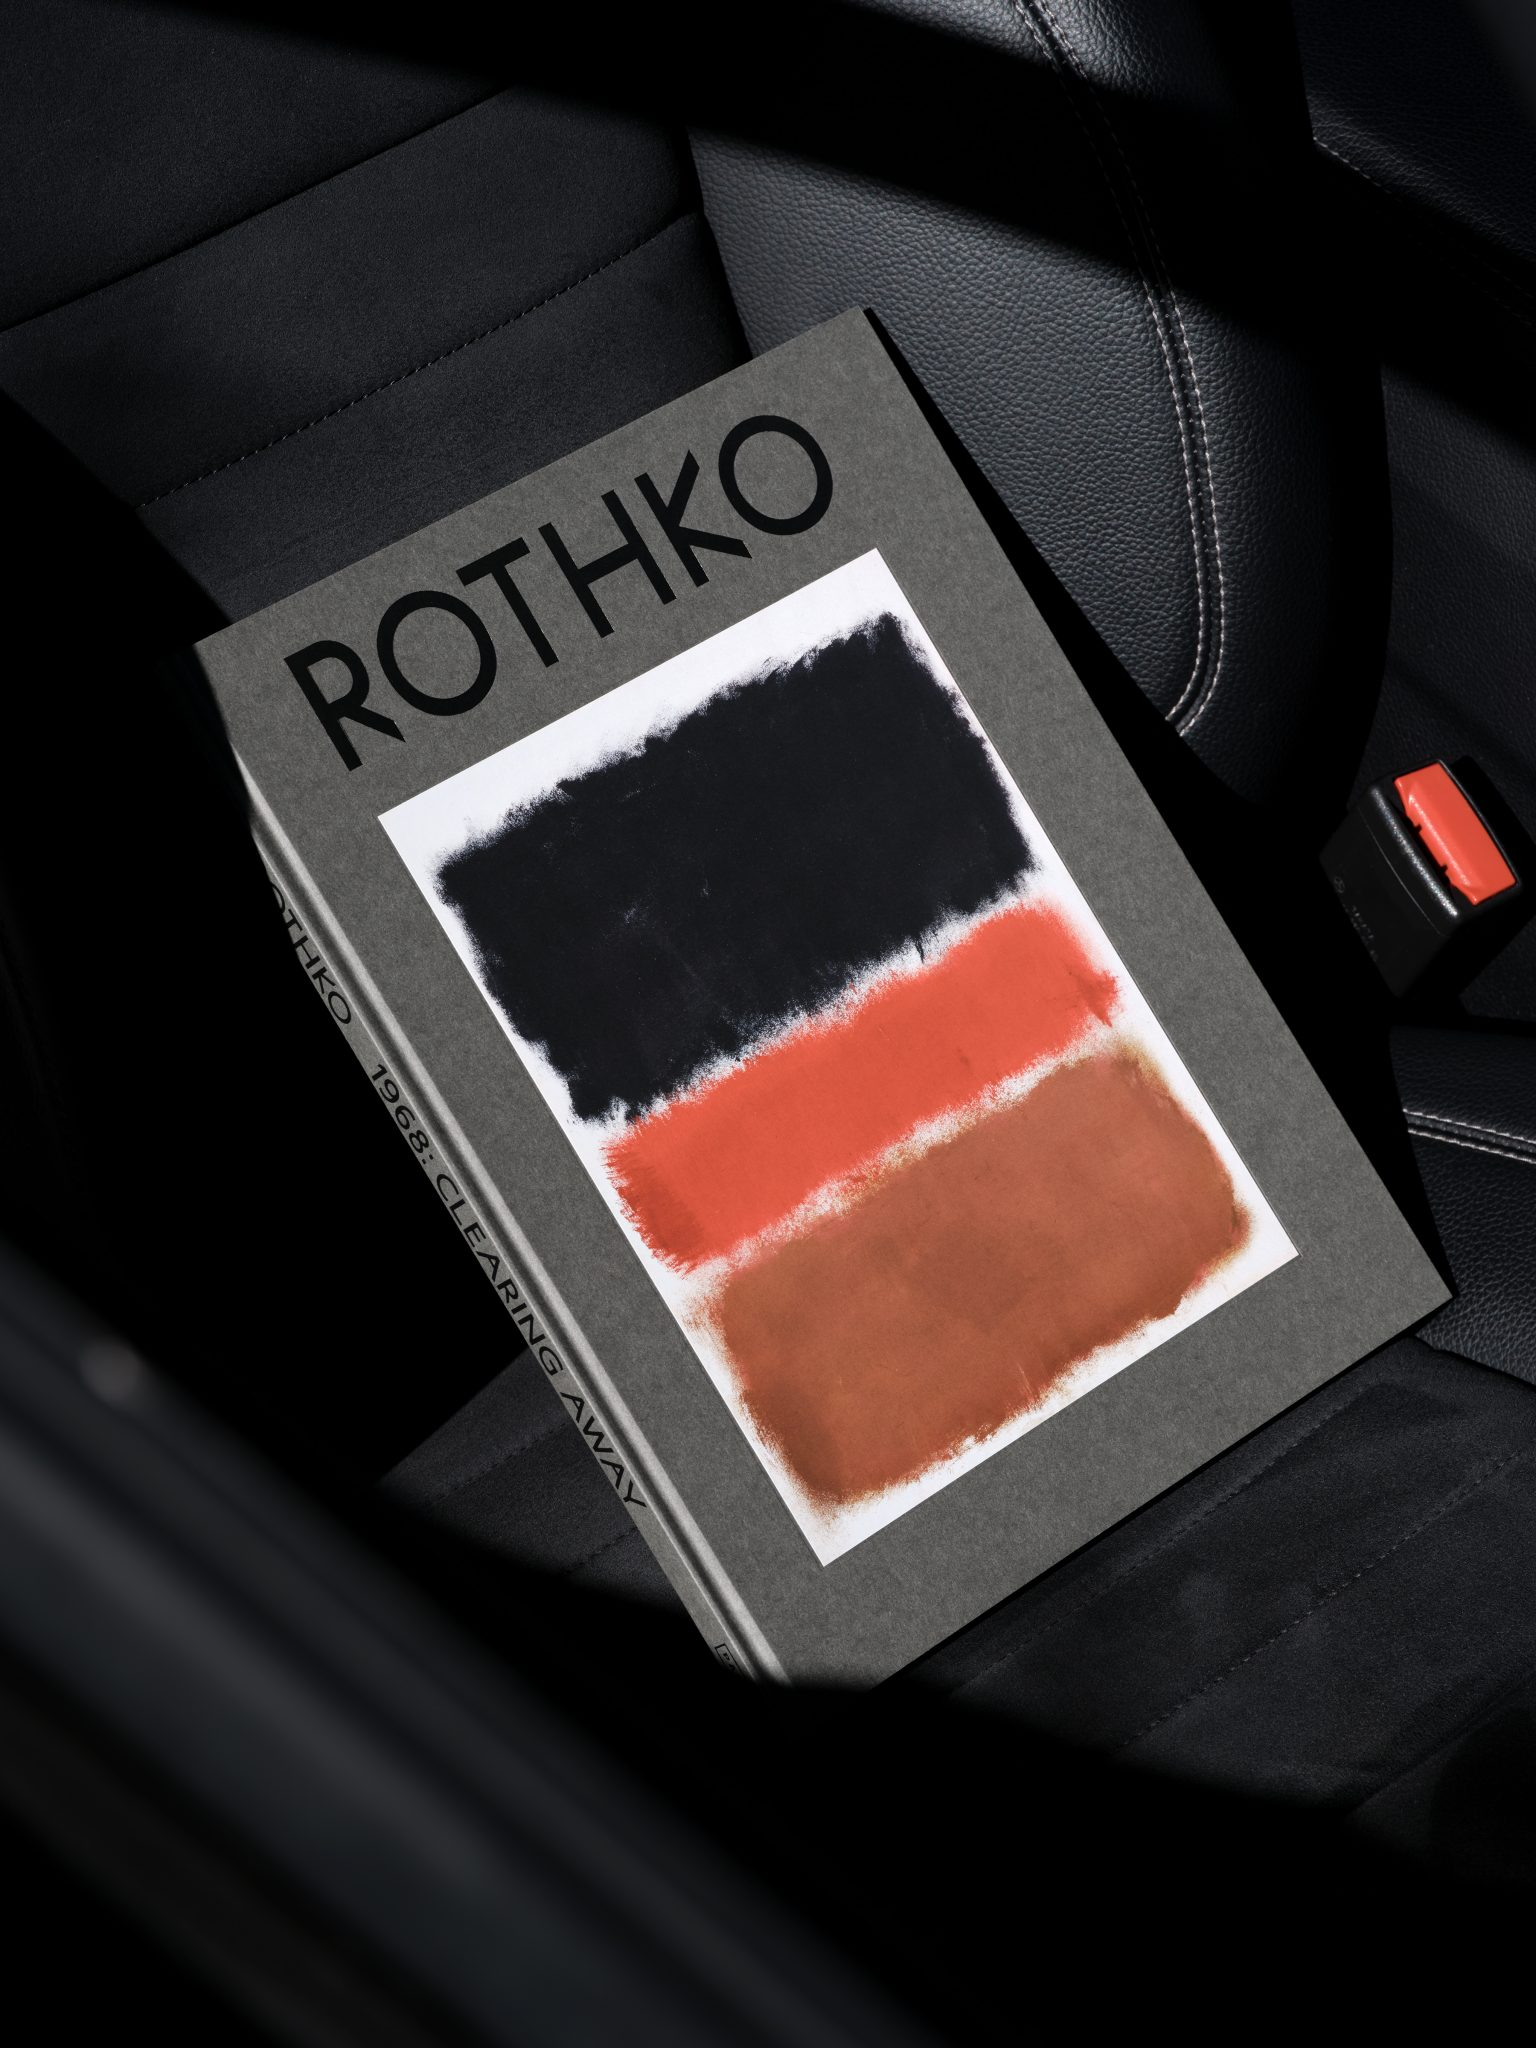 Thomas Adank - Mark Rothko 1968: Clearing Away